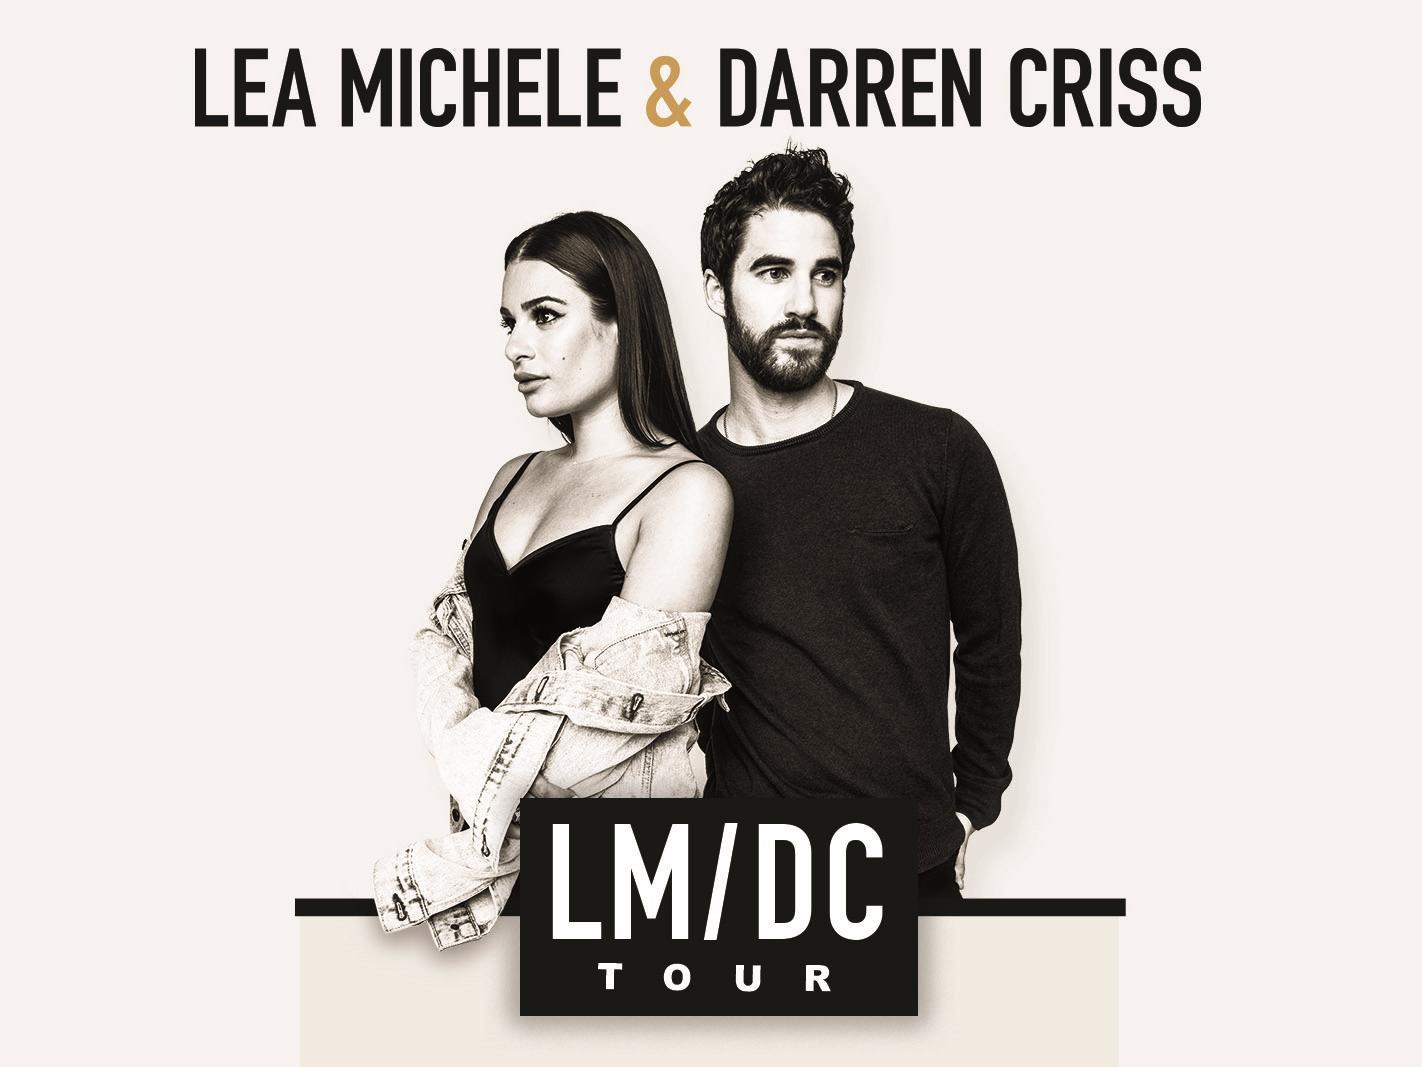 Lea Michele Darren Criss Lmdc Tour Vip Packages Tickets O2